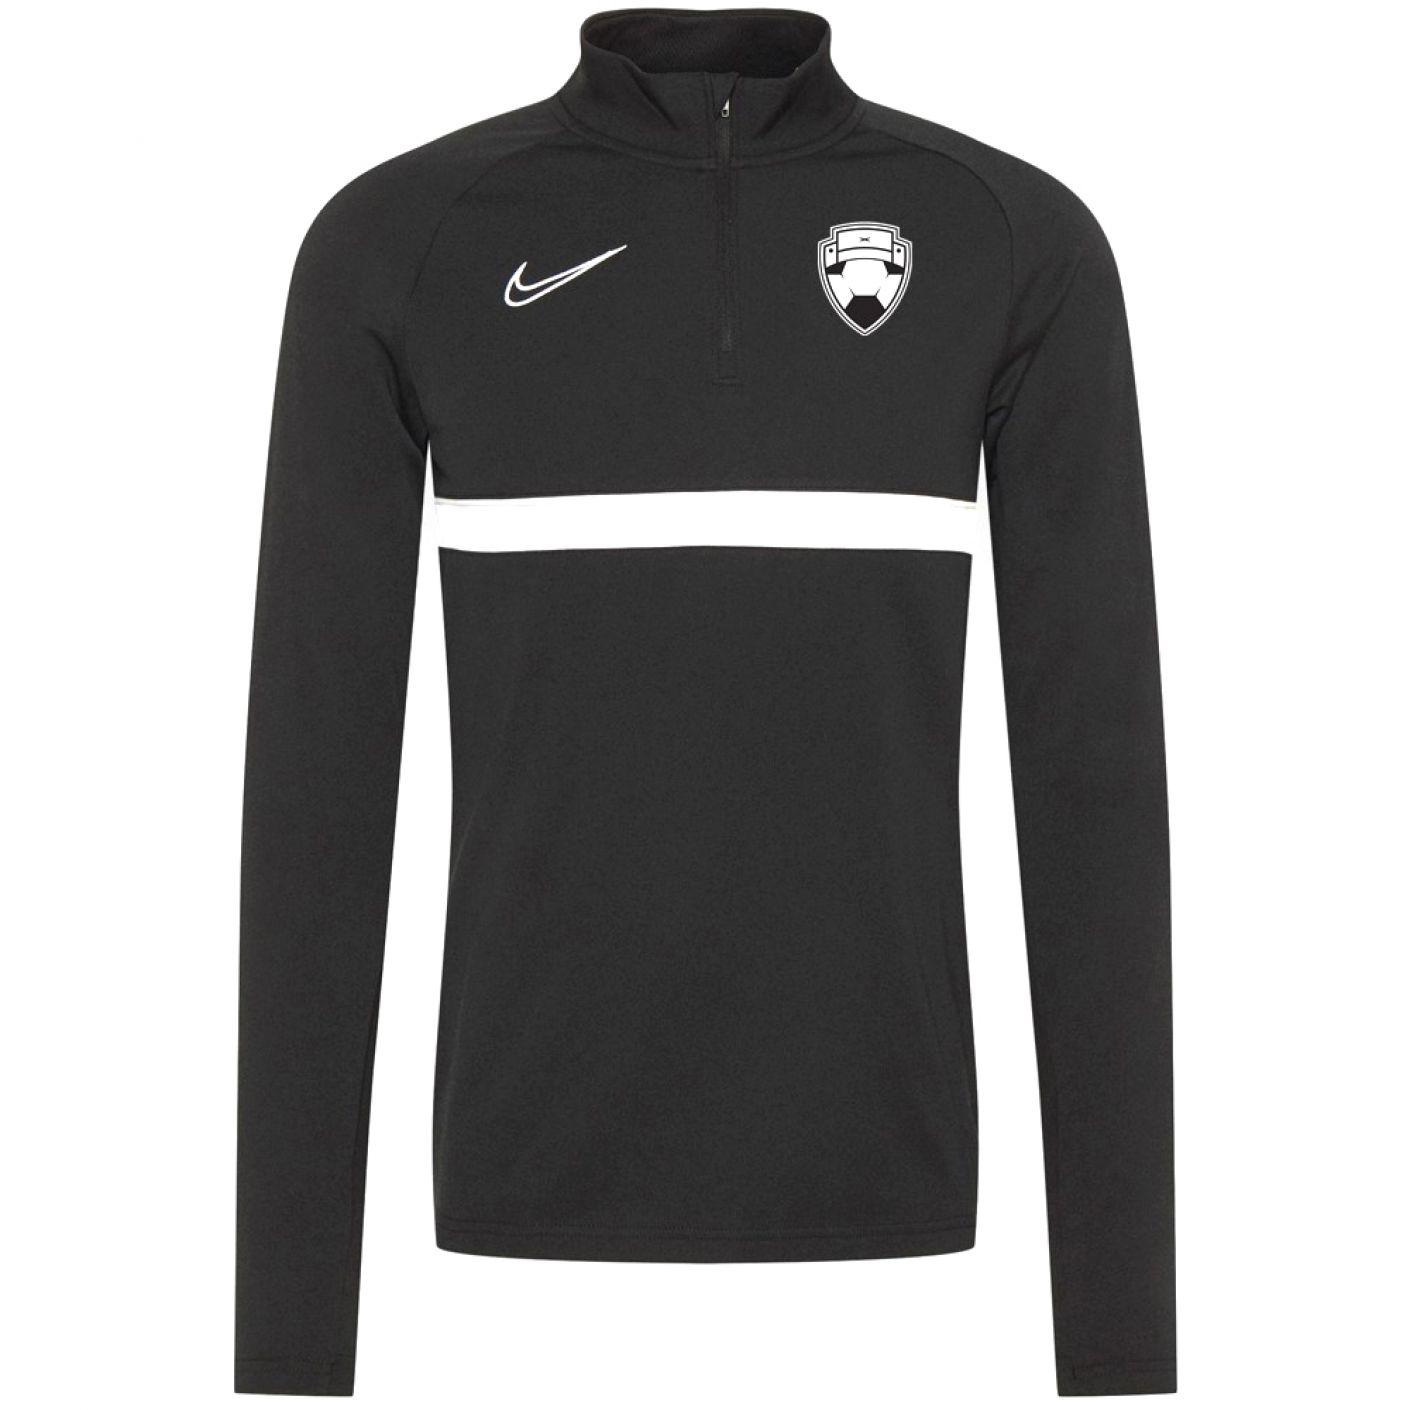 Nike Bankzitters Trainingstrui Zwart Wit